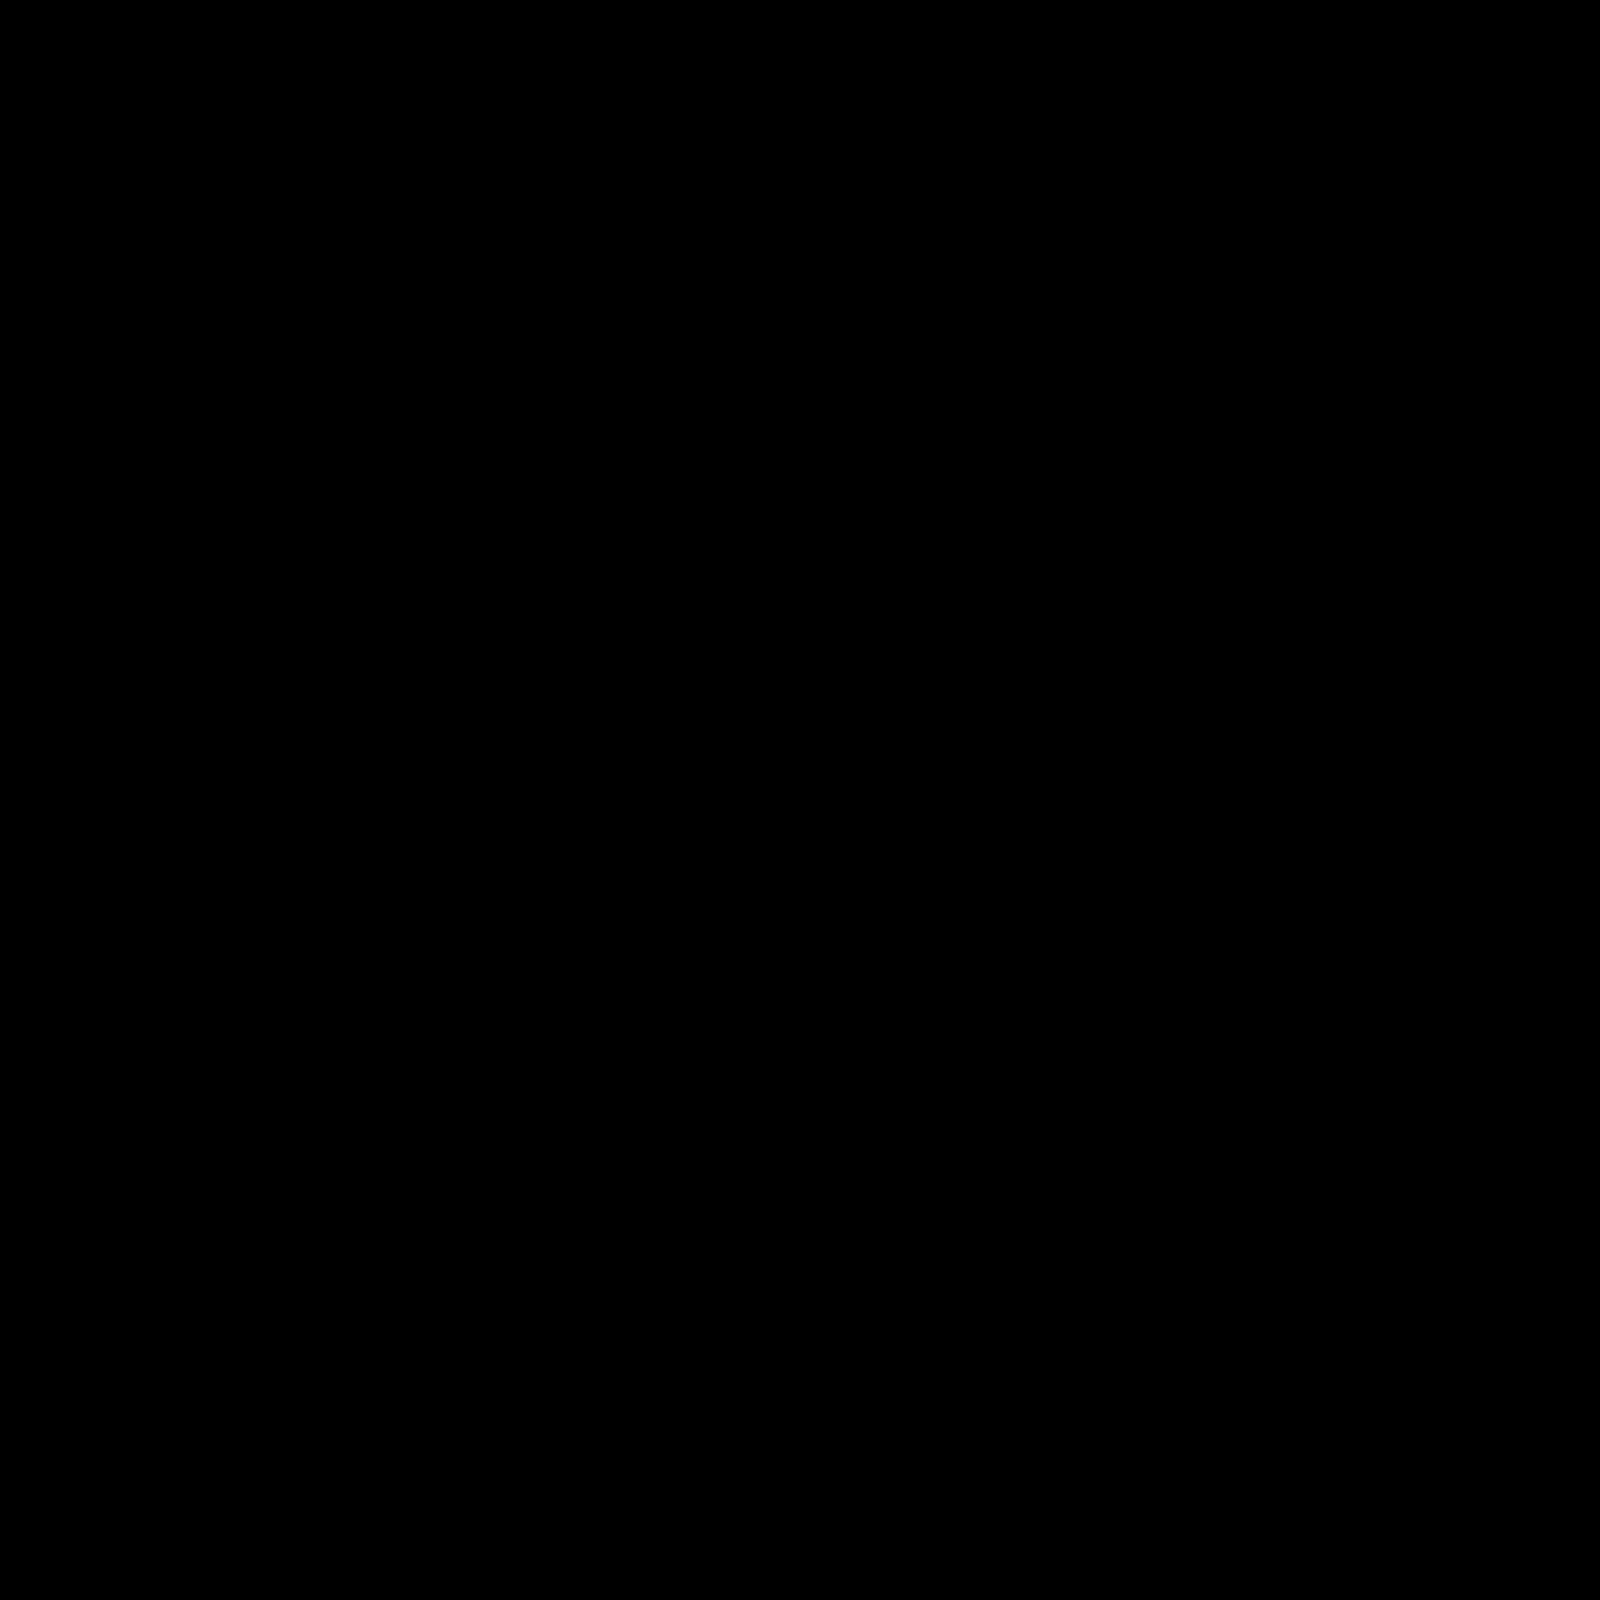 VOX Player icon